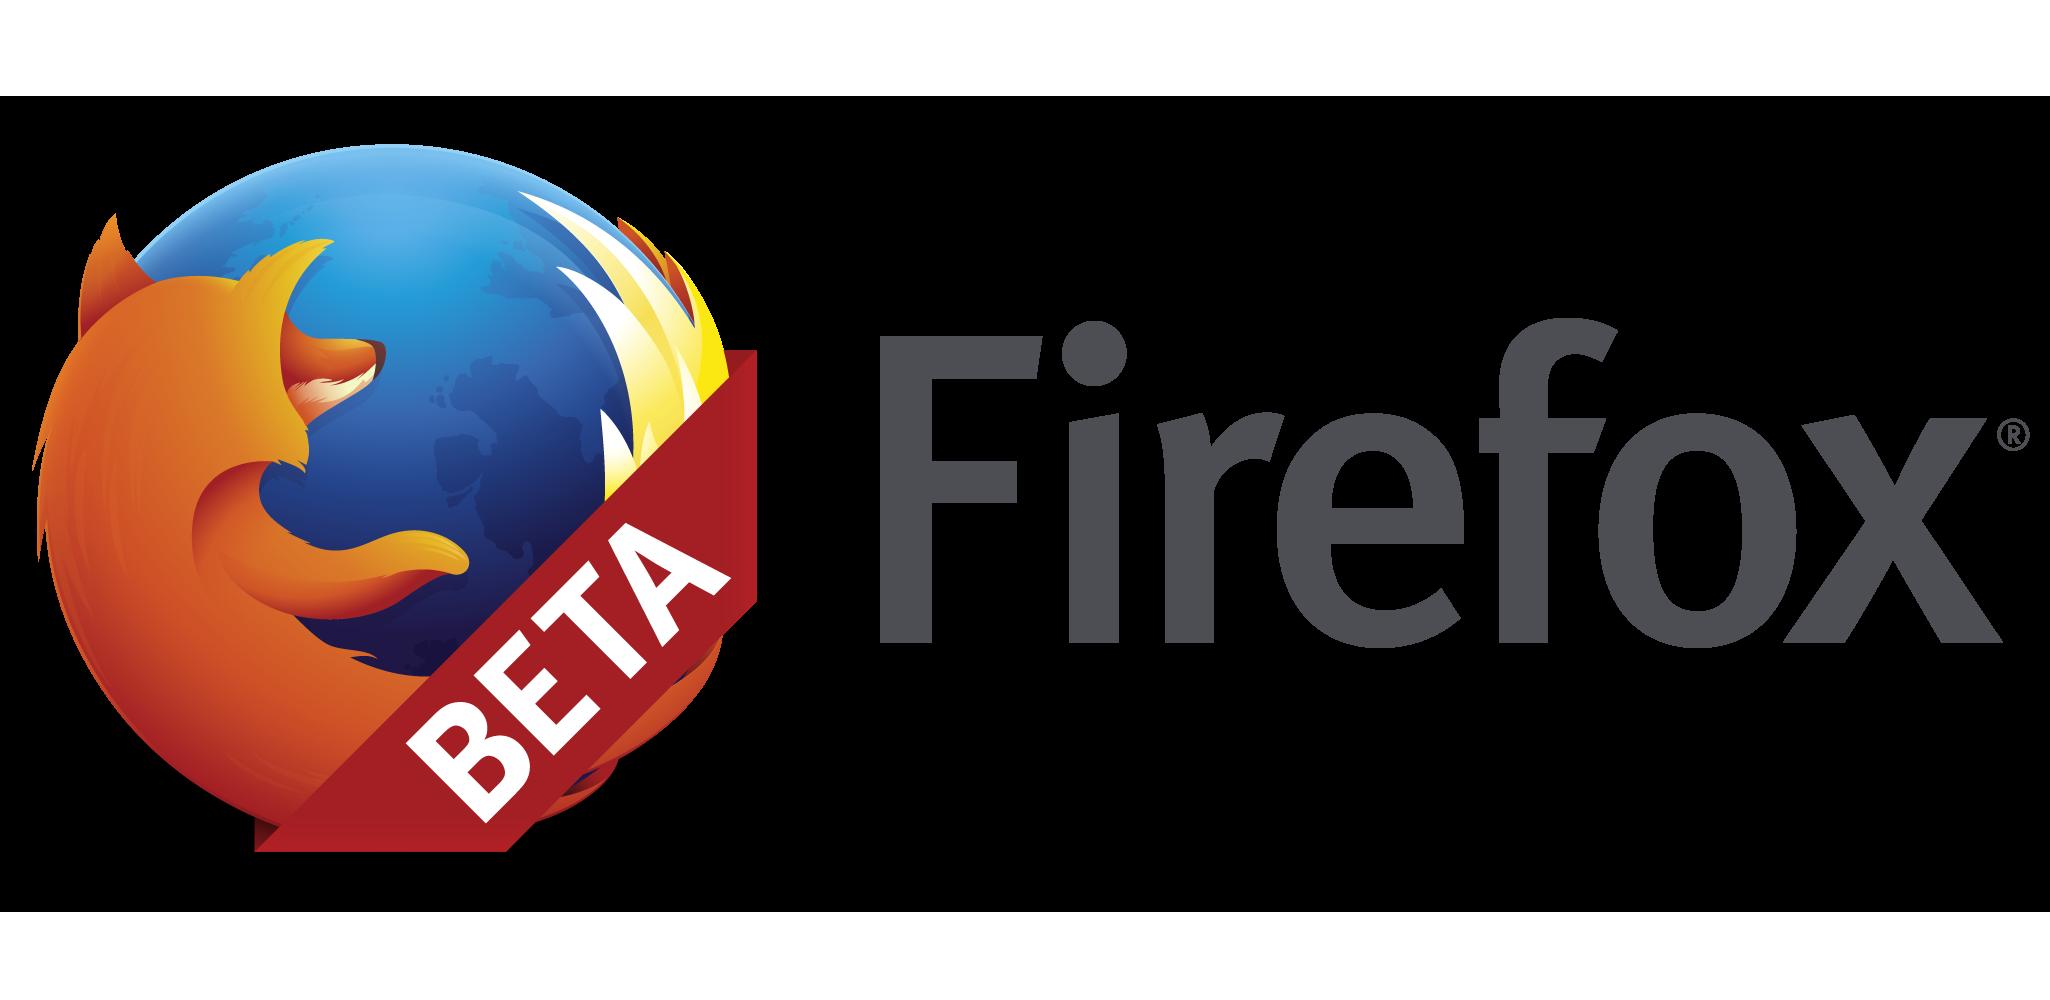 Firefox Beta Download